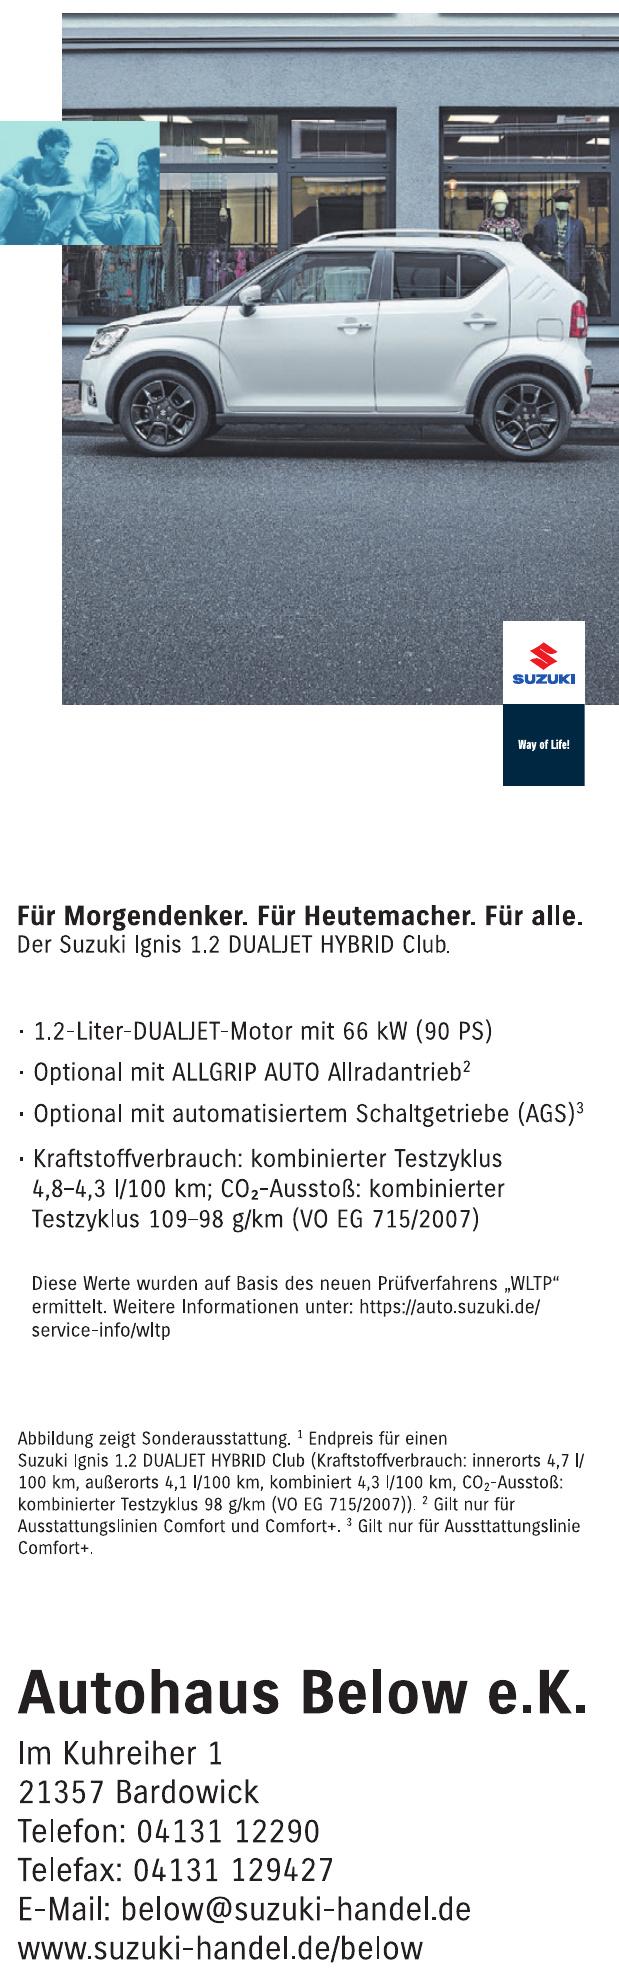 Autohaus Below e.K.